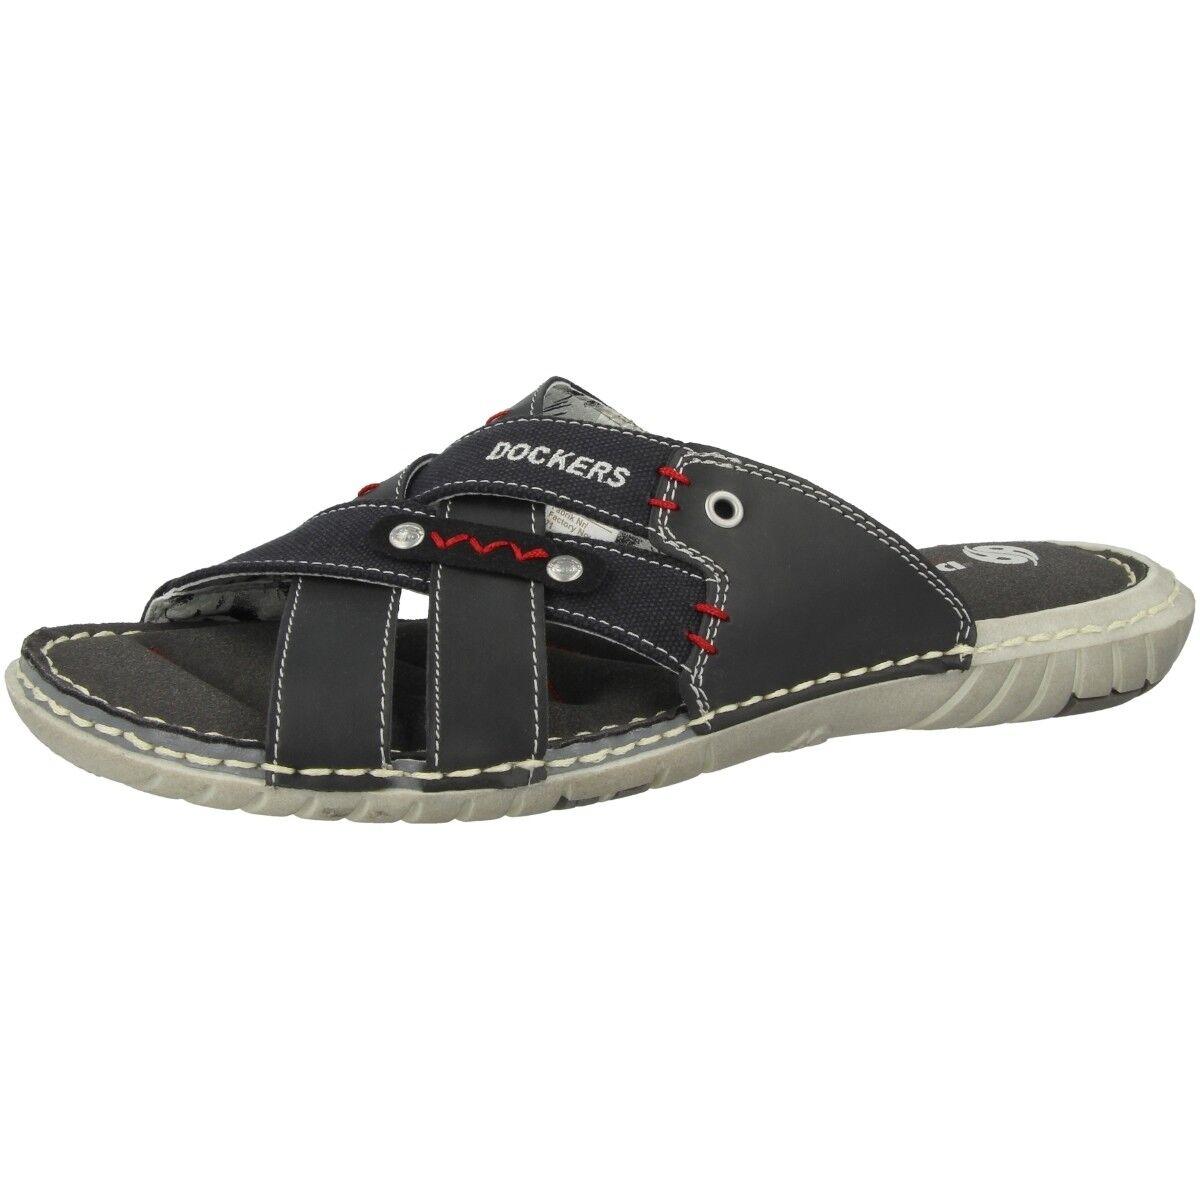 Dockers By Gerli 38SD006 38SD006-600100 Sandali Pantofole Scarpe Pantofole 38SD006-600100 38SD006 93b9e8